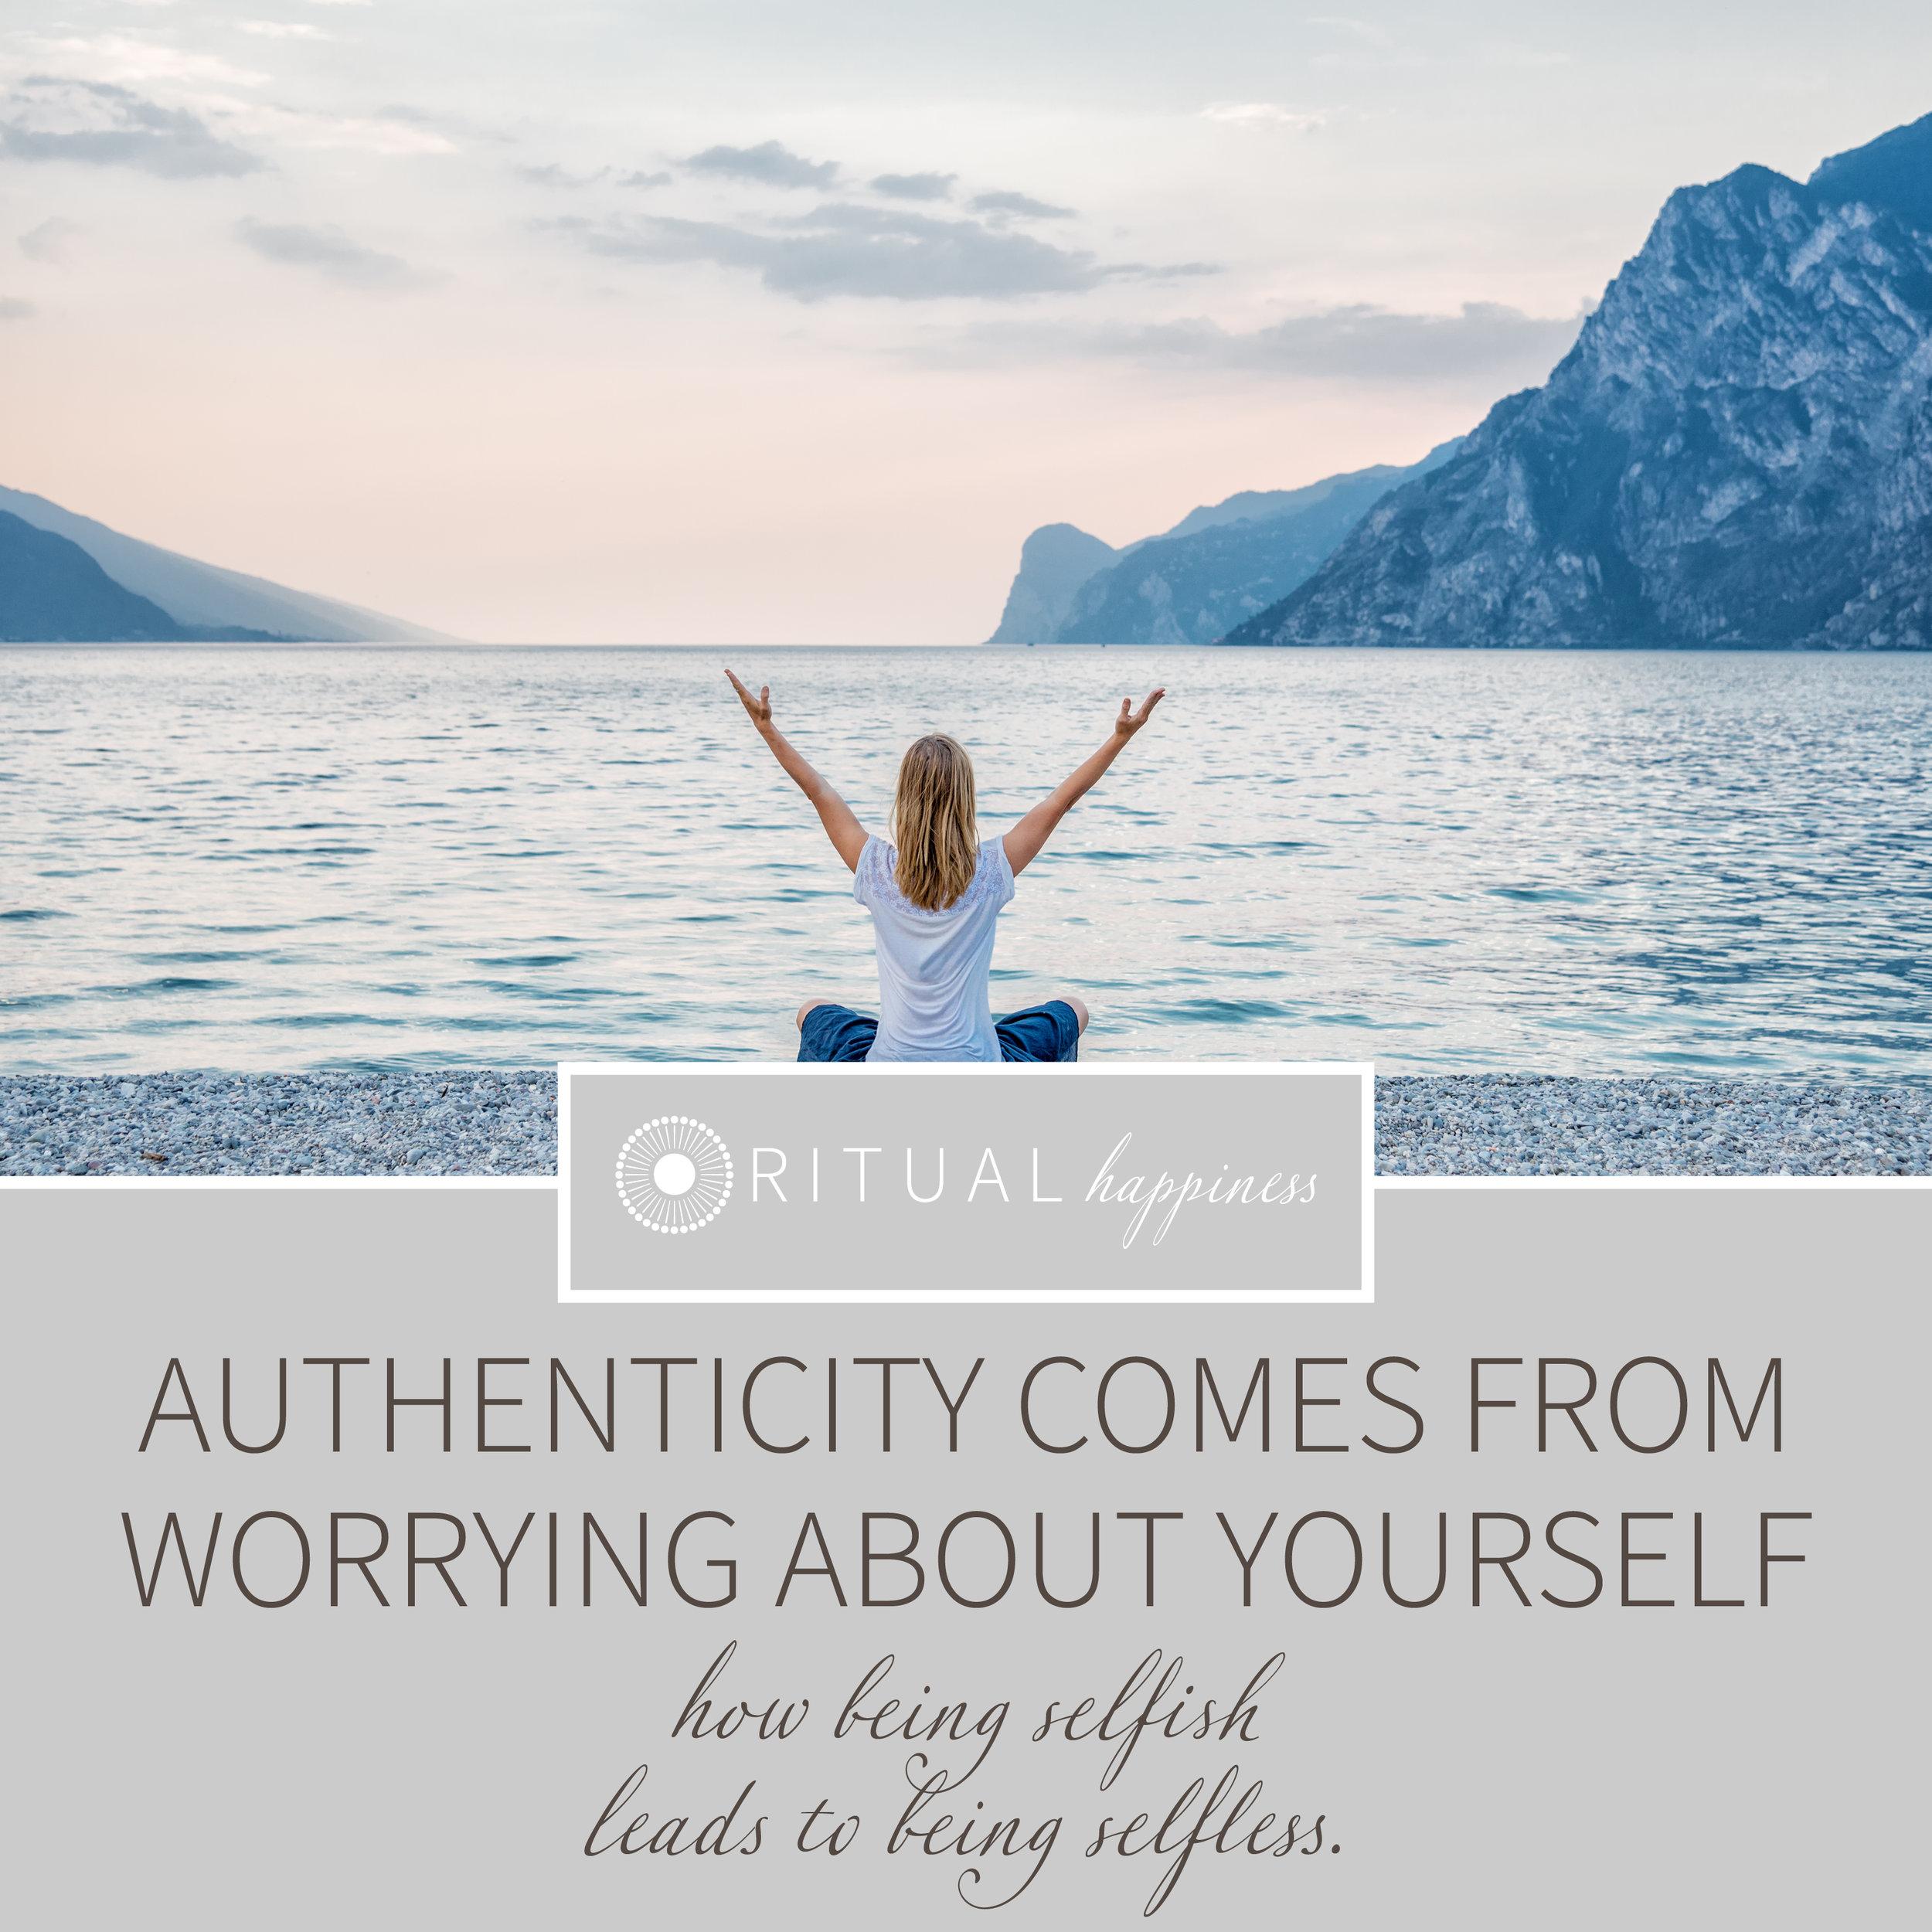 authenticity_selfless.jpg